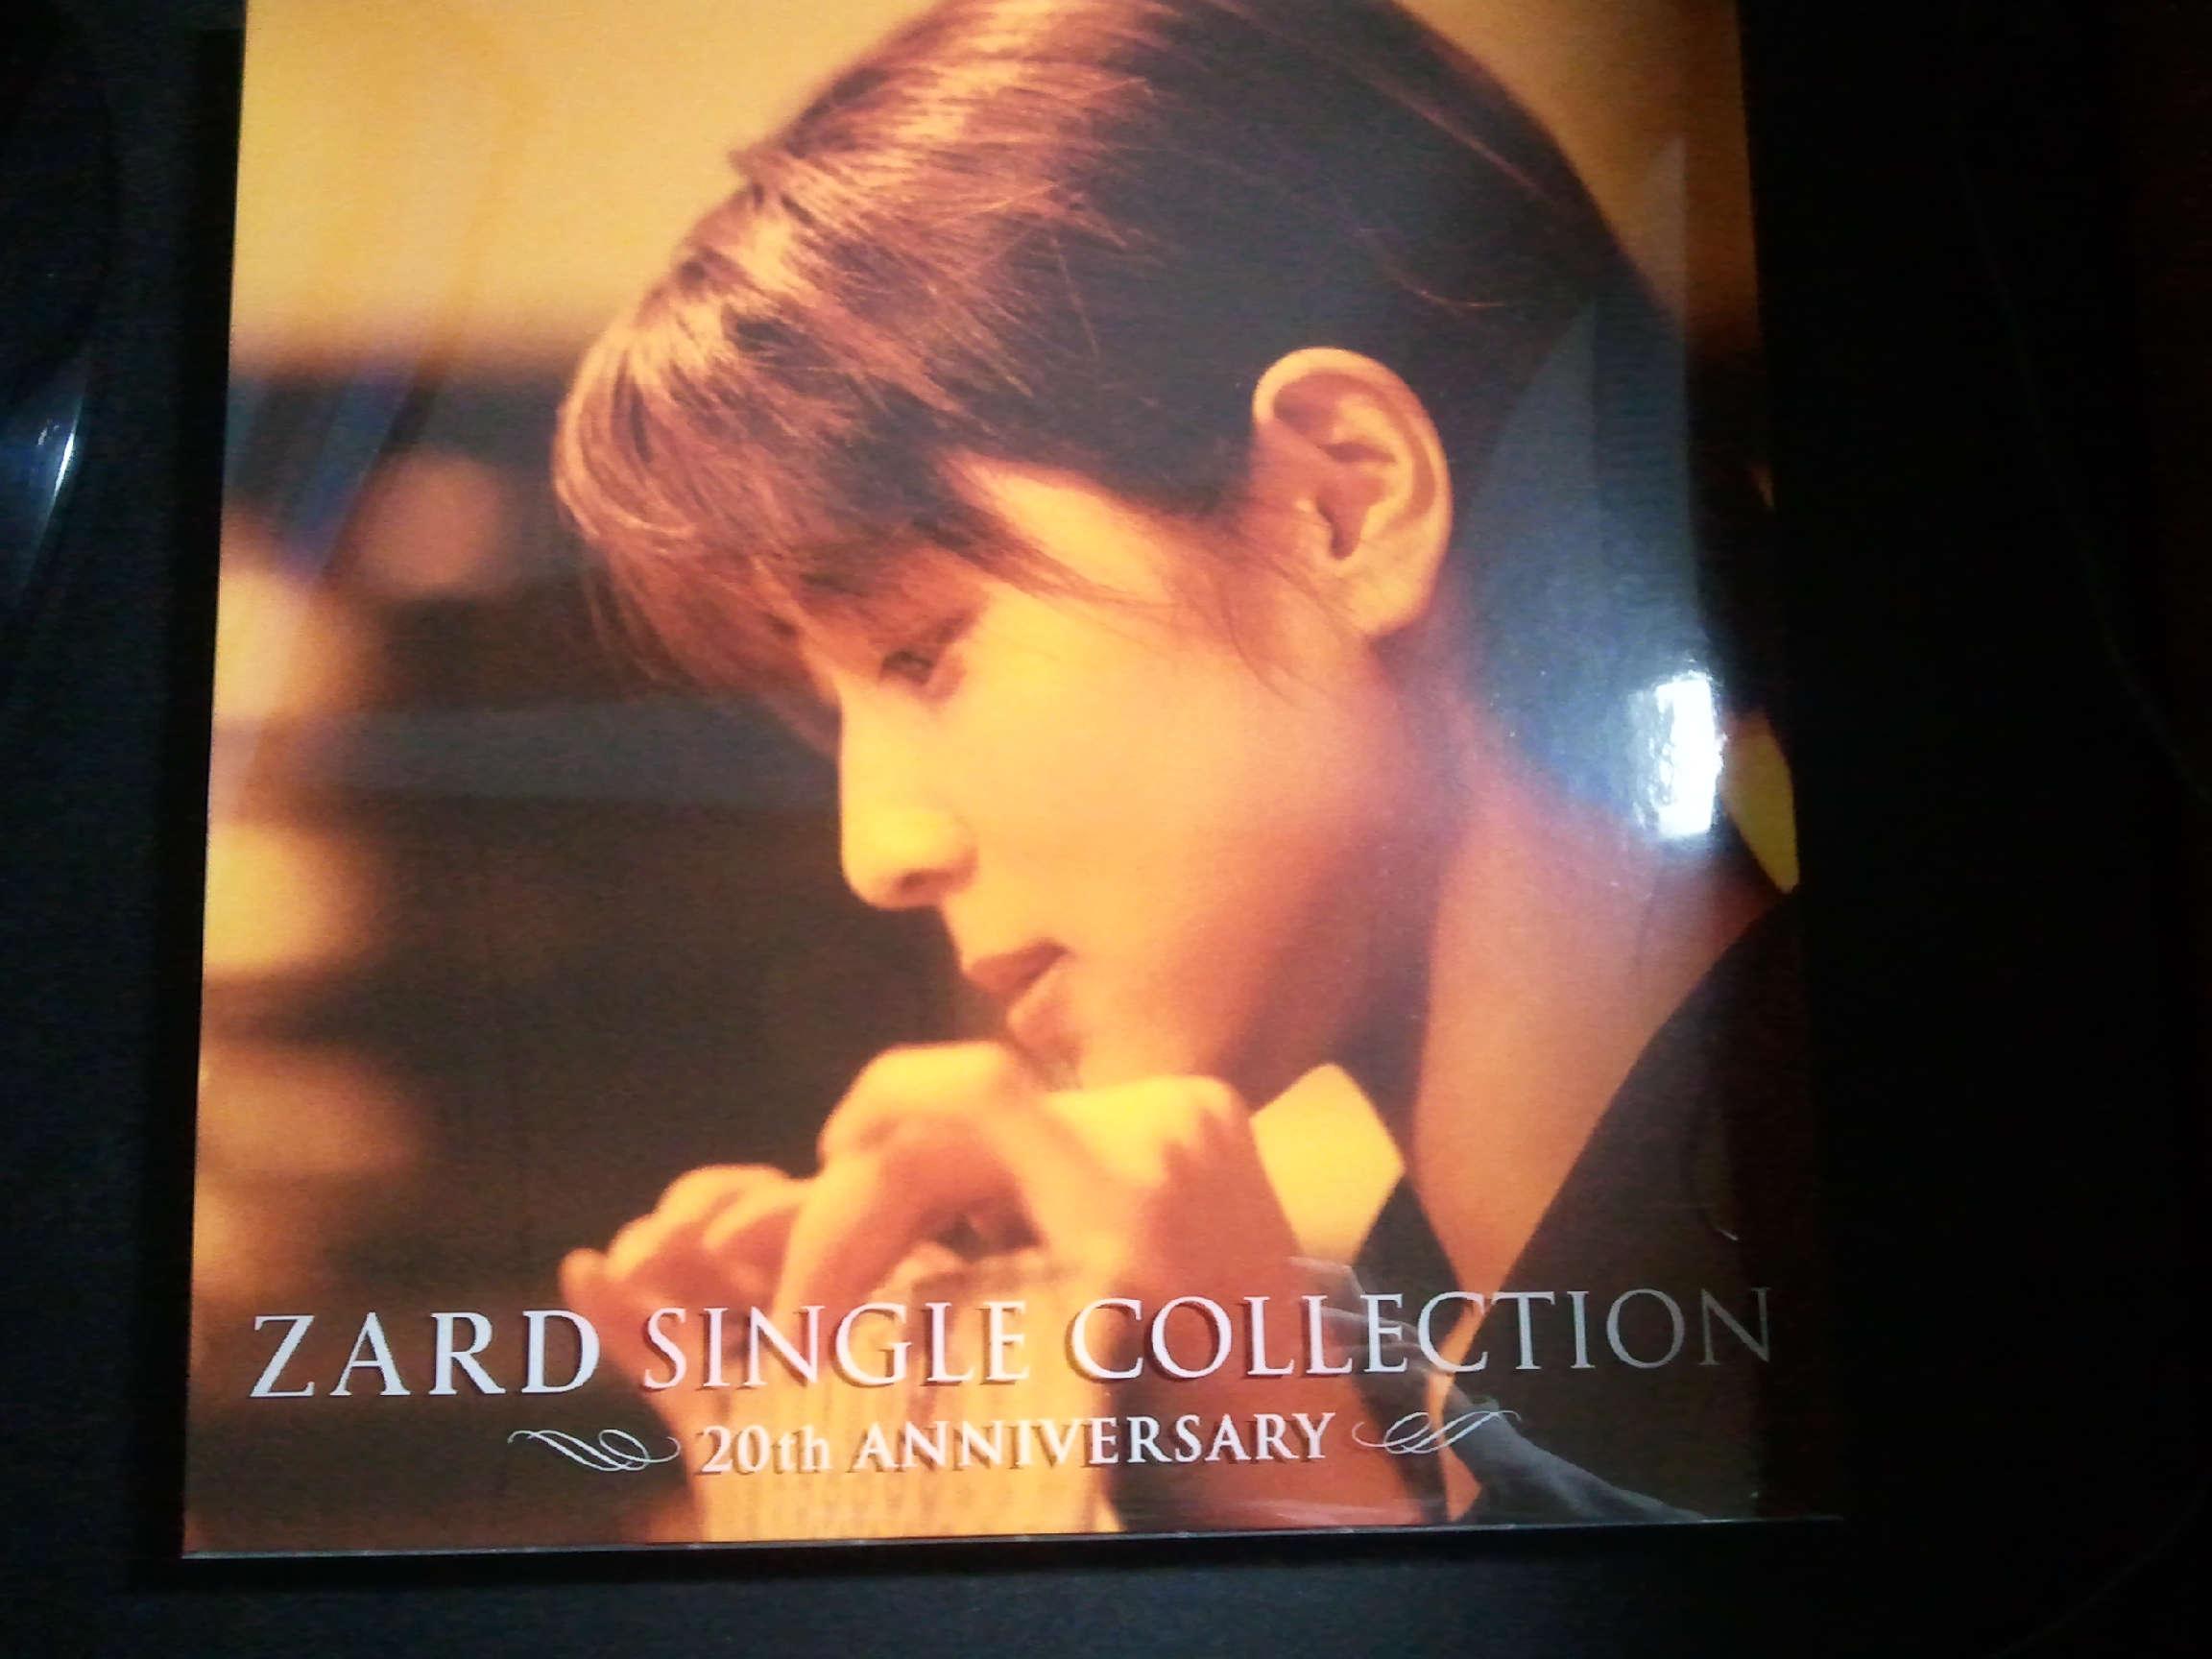 ZARD Single Collection